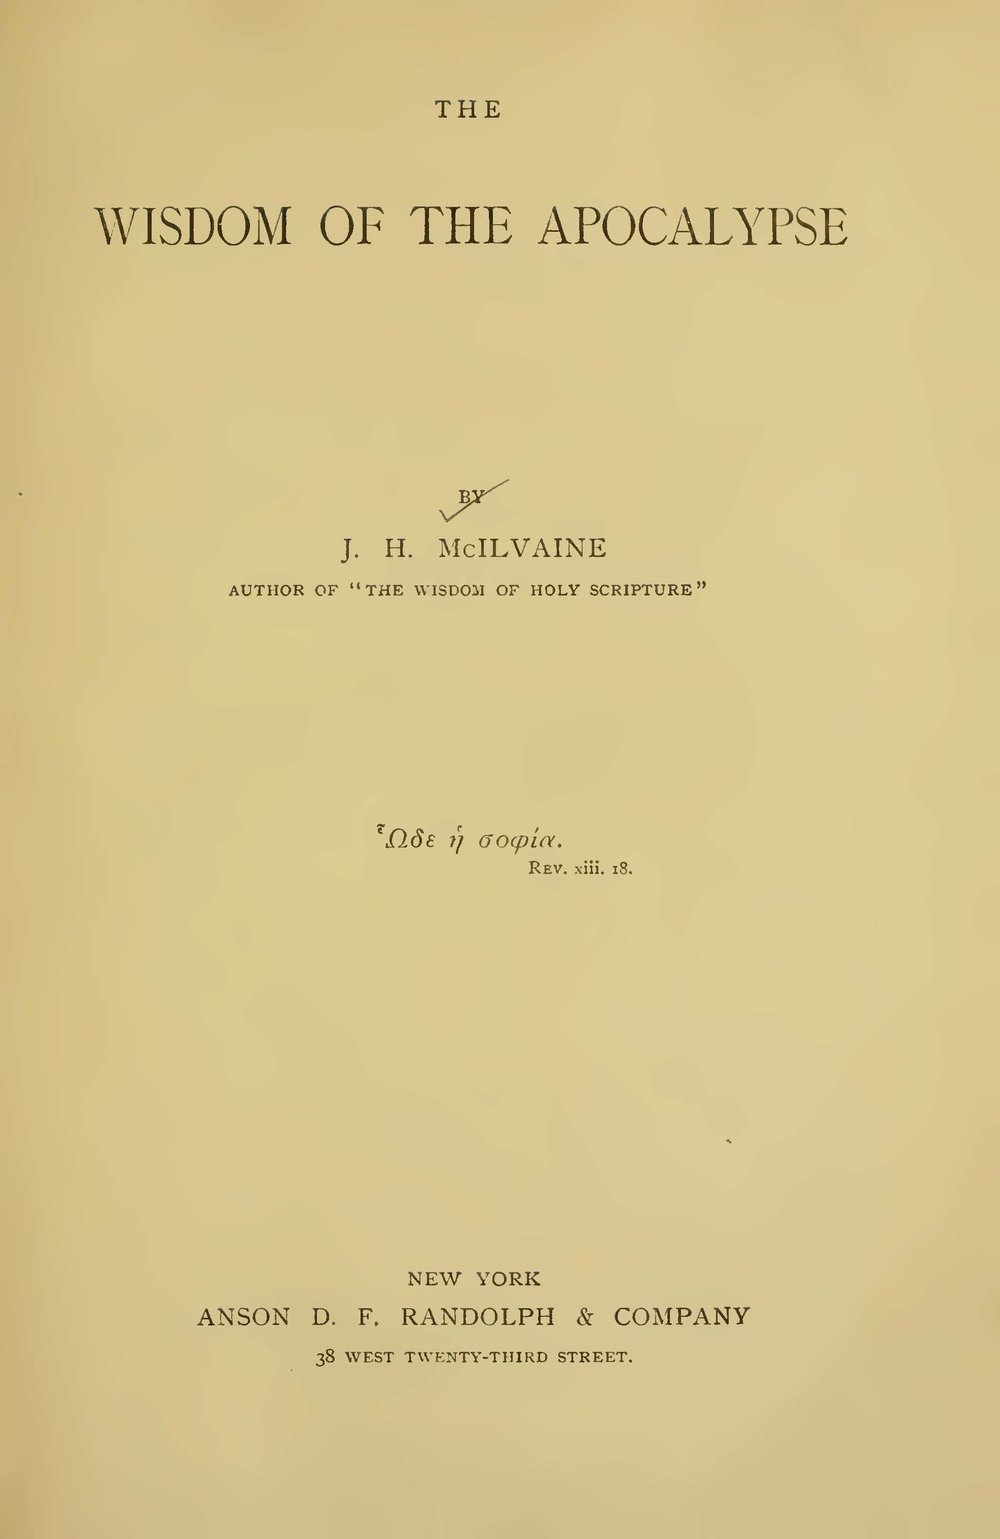 McIlvaine, Joshua Hall, The Wisdom of the Apocalypse Title Page.jpg